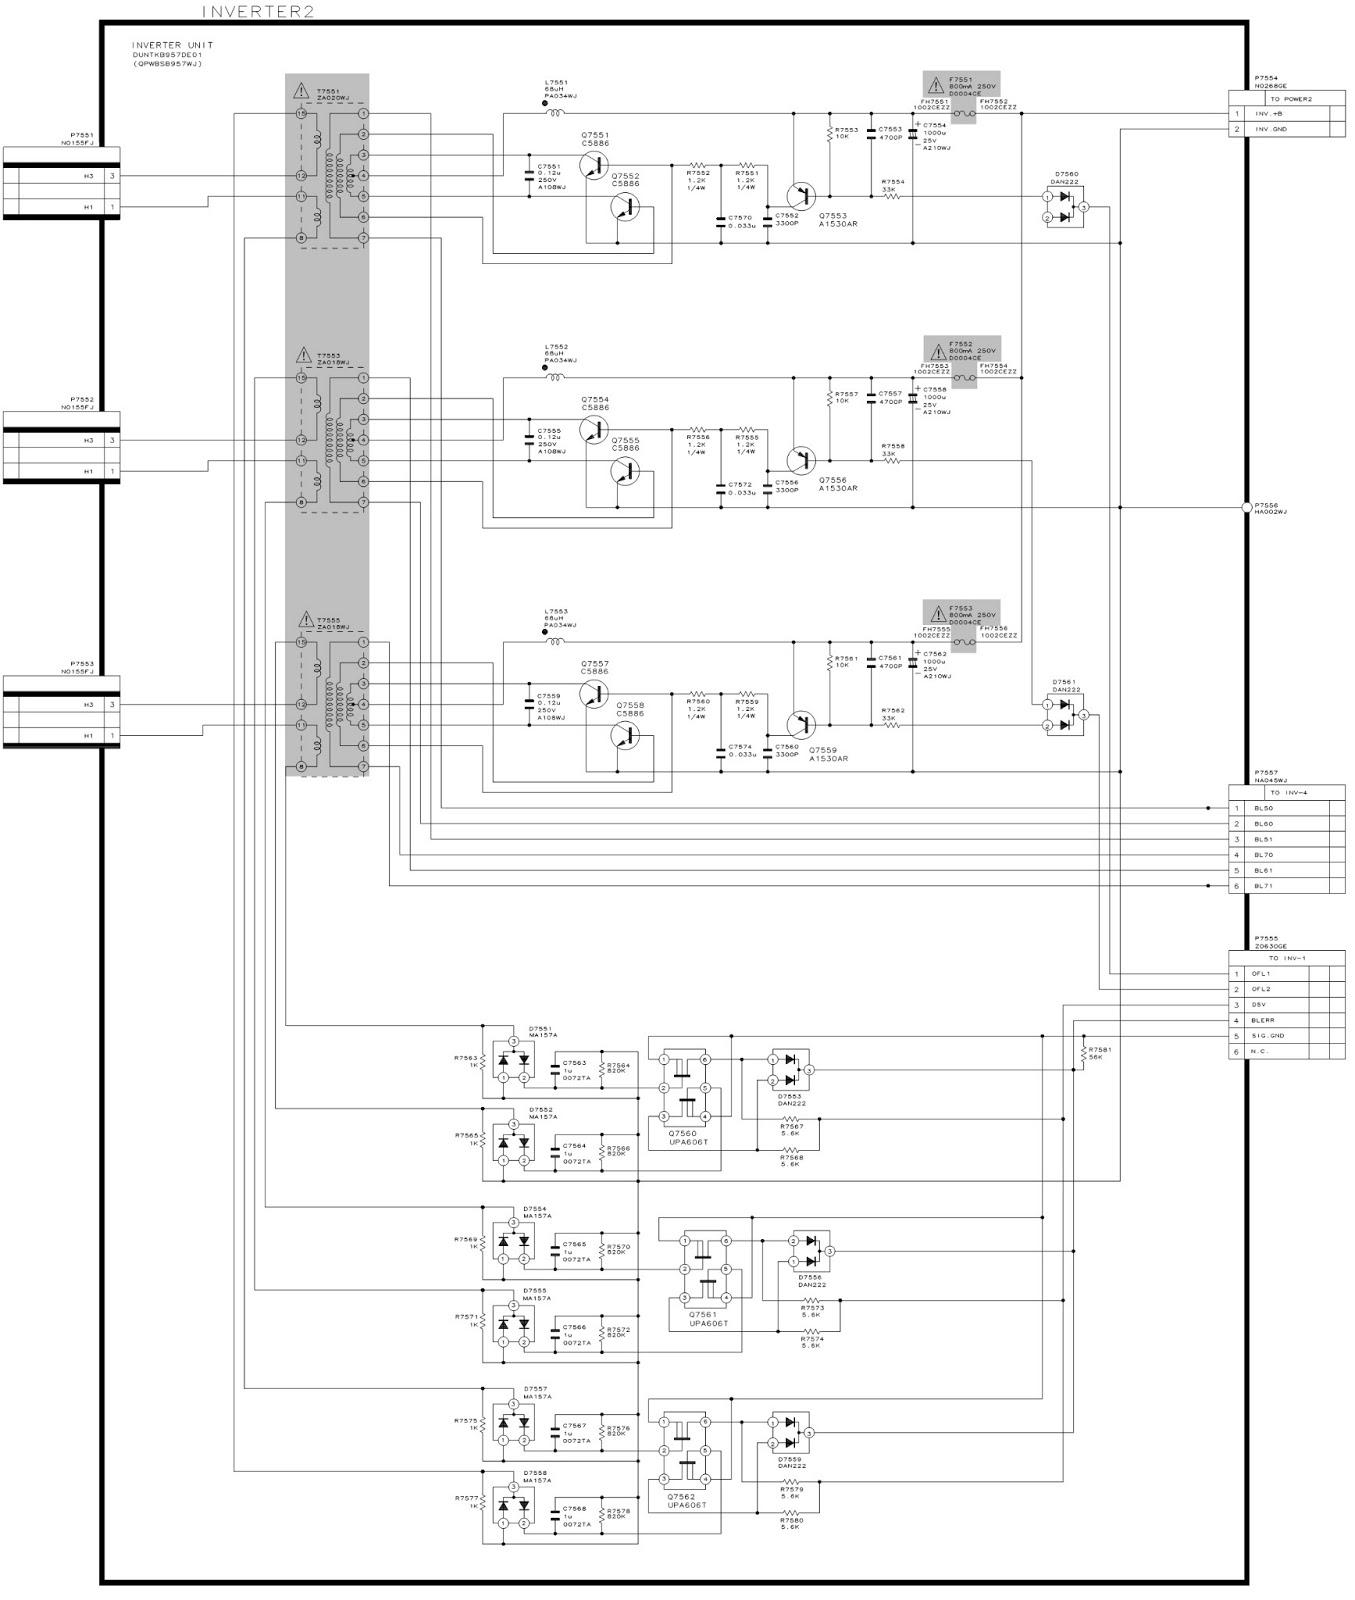 Electro Help  Sharp Lc-m3700 - Lc-m3710